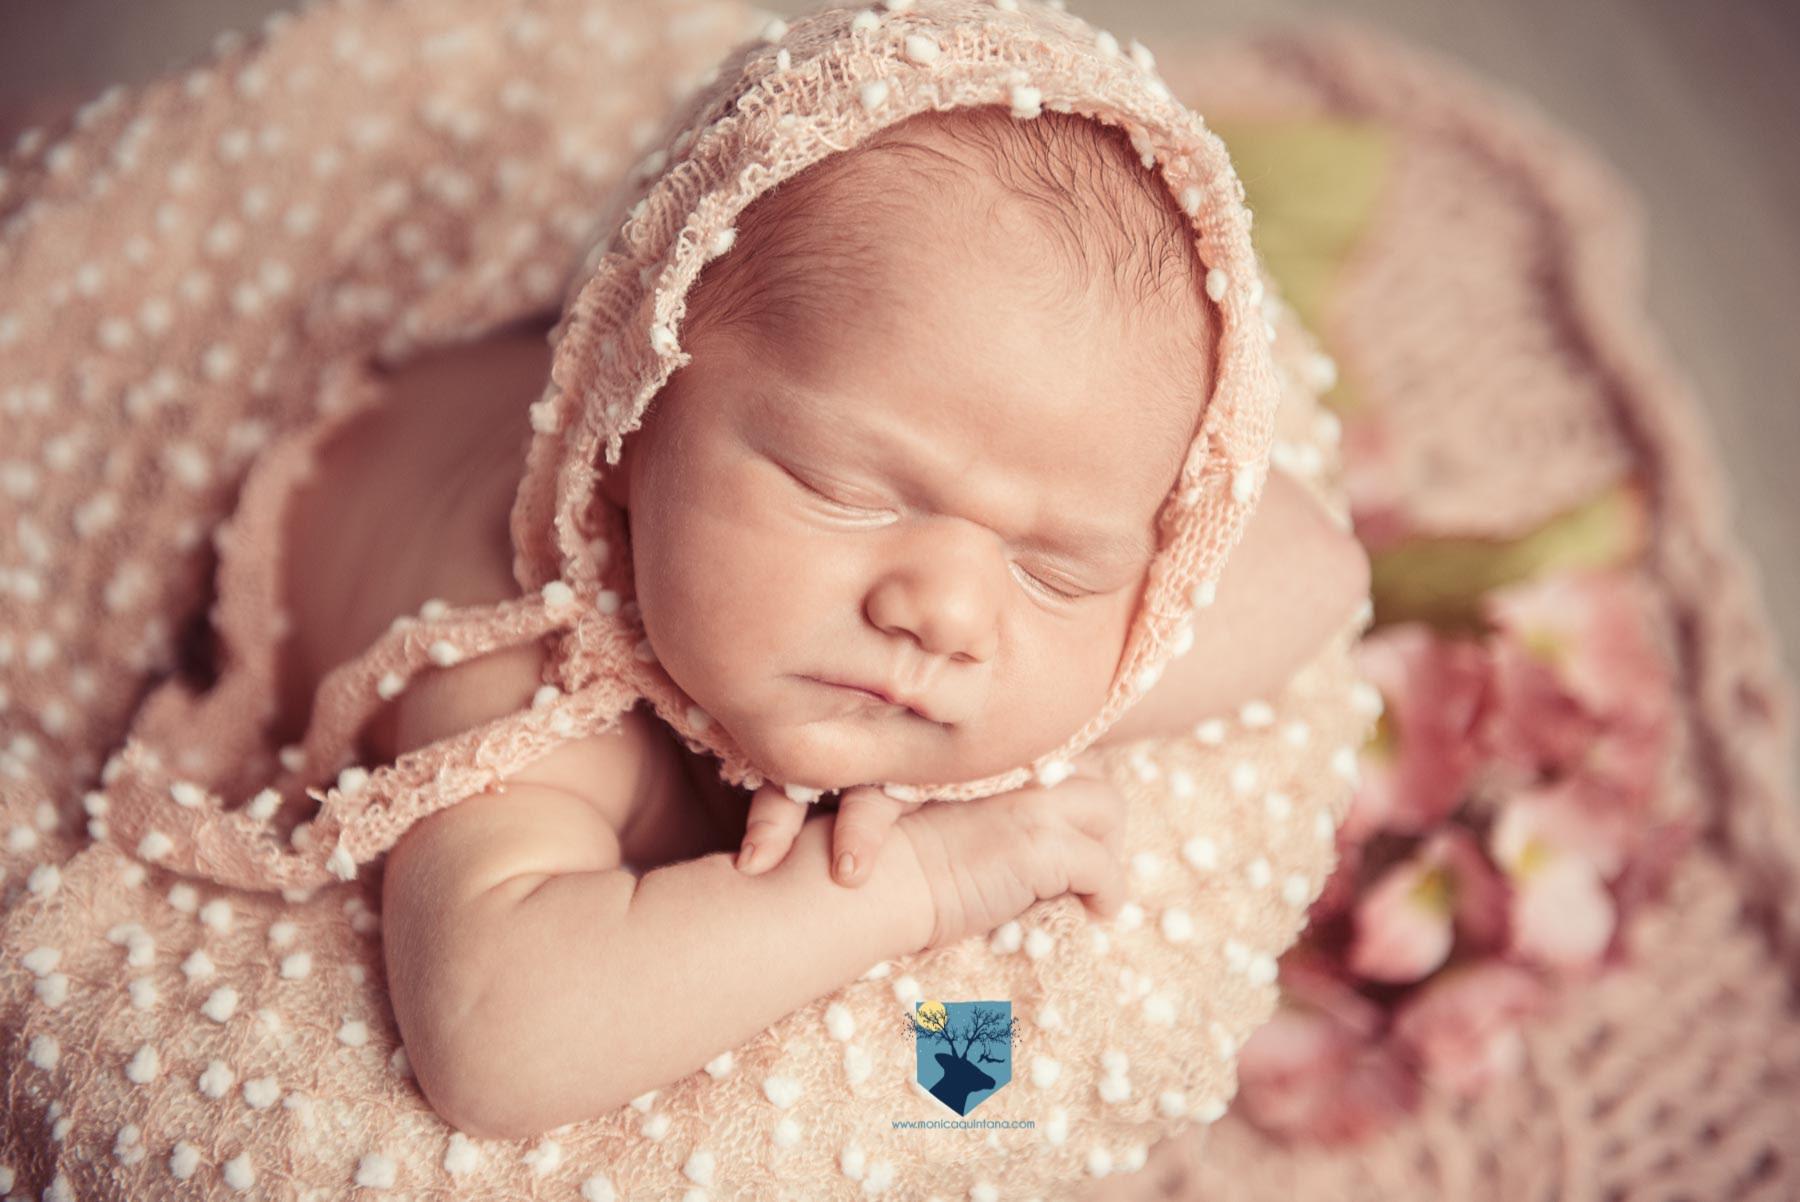 fotografia,girona,figueres,emporda,monica quintana,bebes,niños,familia,retrato,recien,nacido,nado,newborn